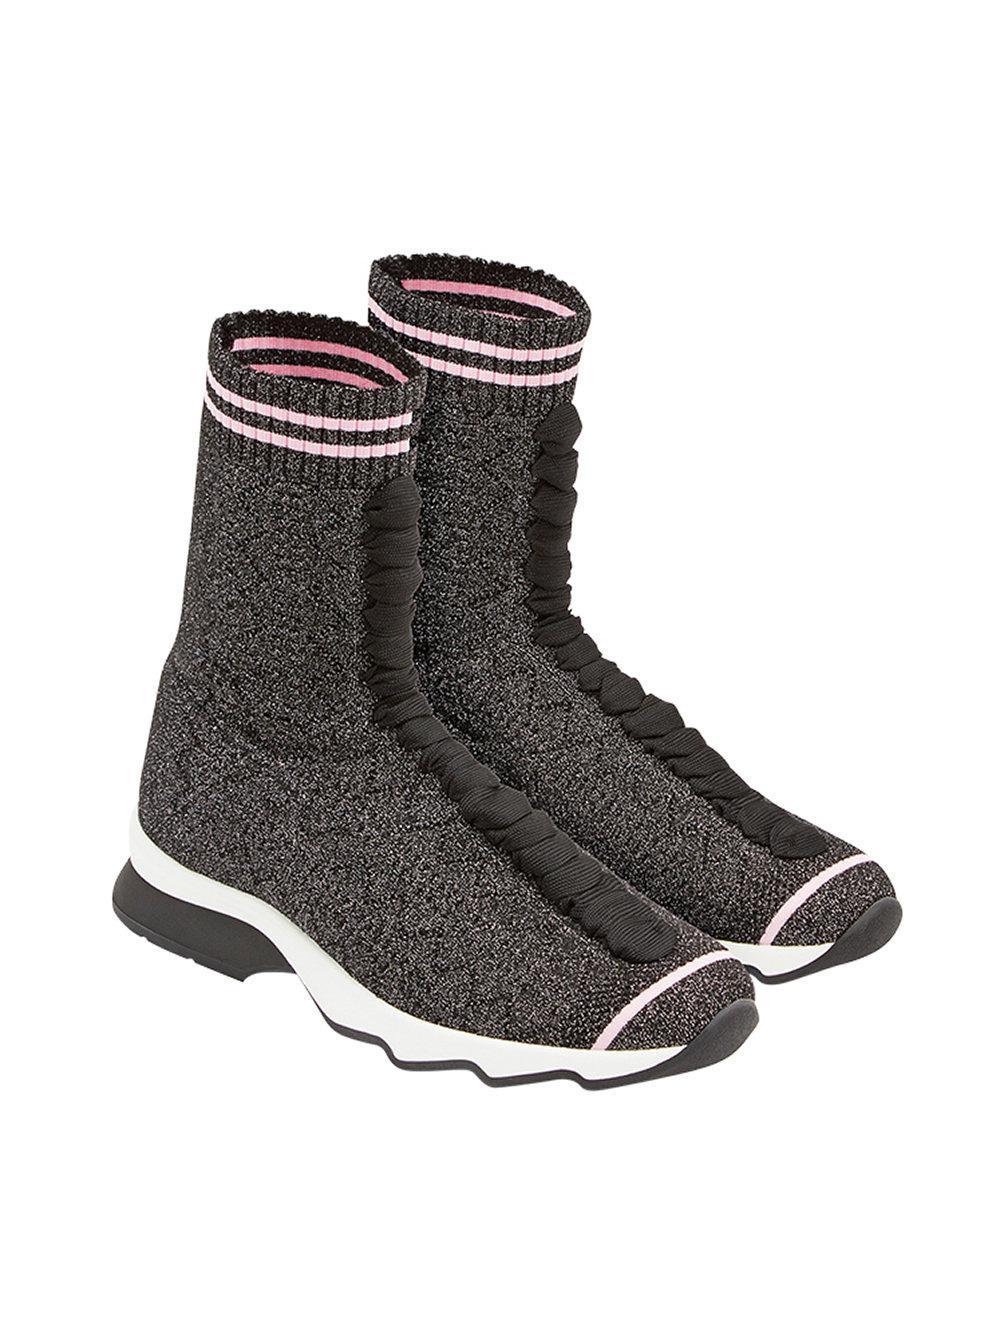 Fendi Fabric Sock Sneakers in Black - Save 45%